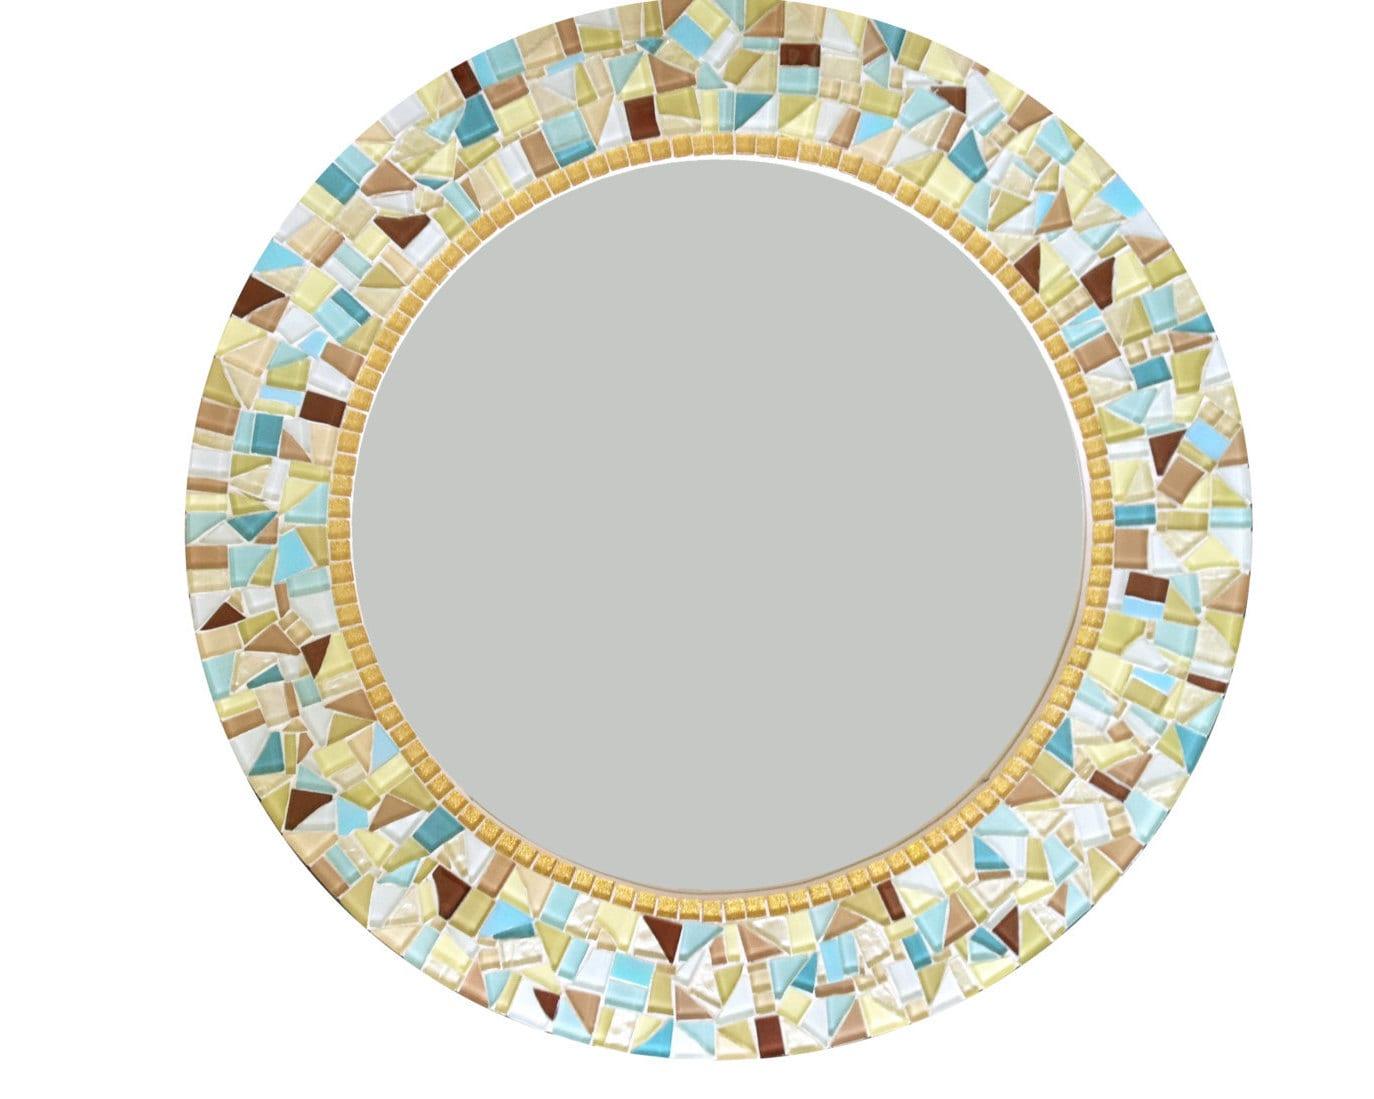 Wall mirror round mosaic mirror decorative mirror for Mosaic mirror